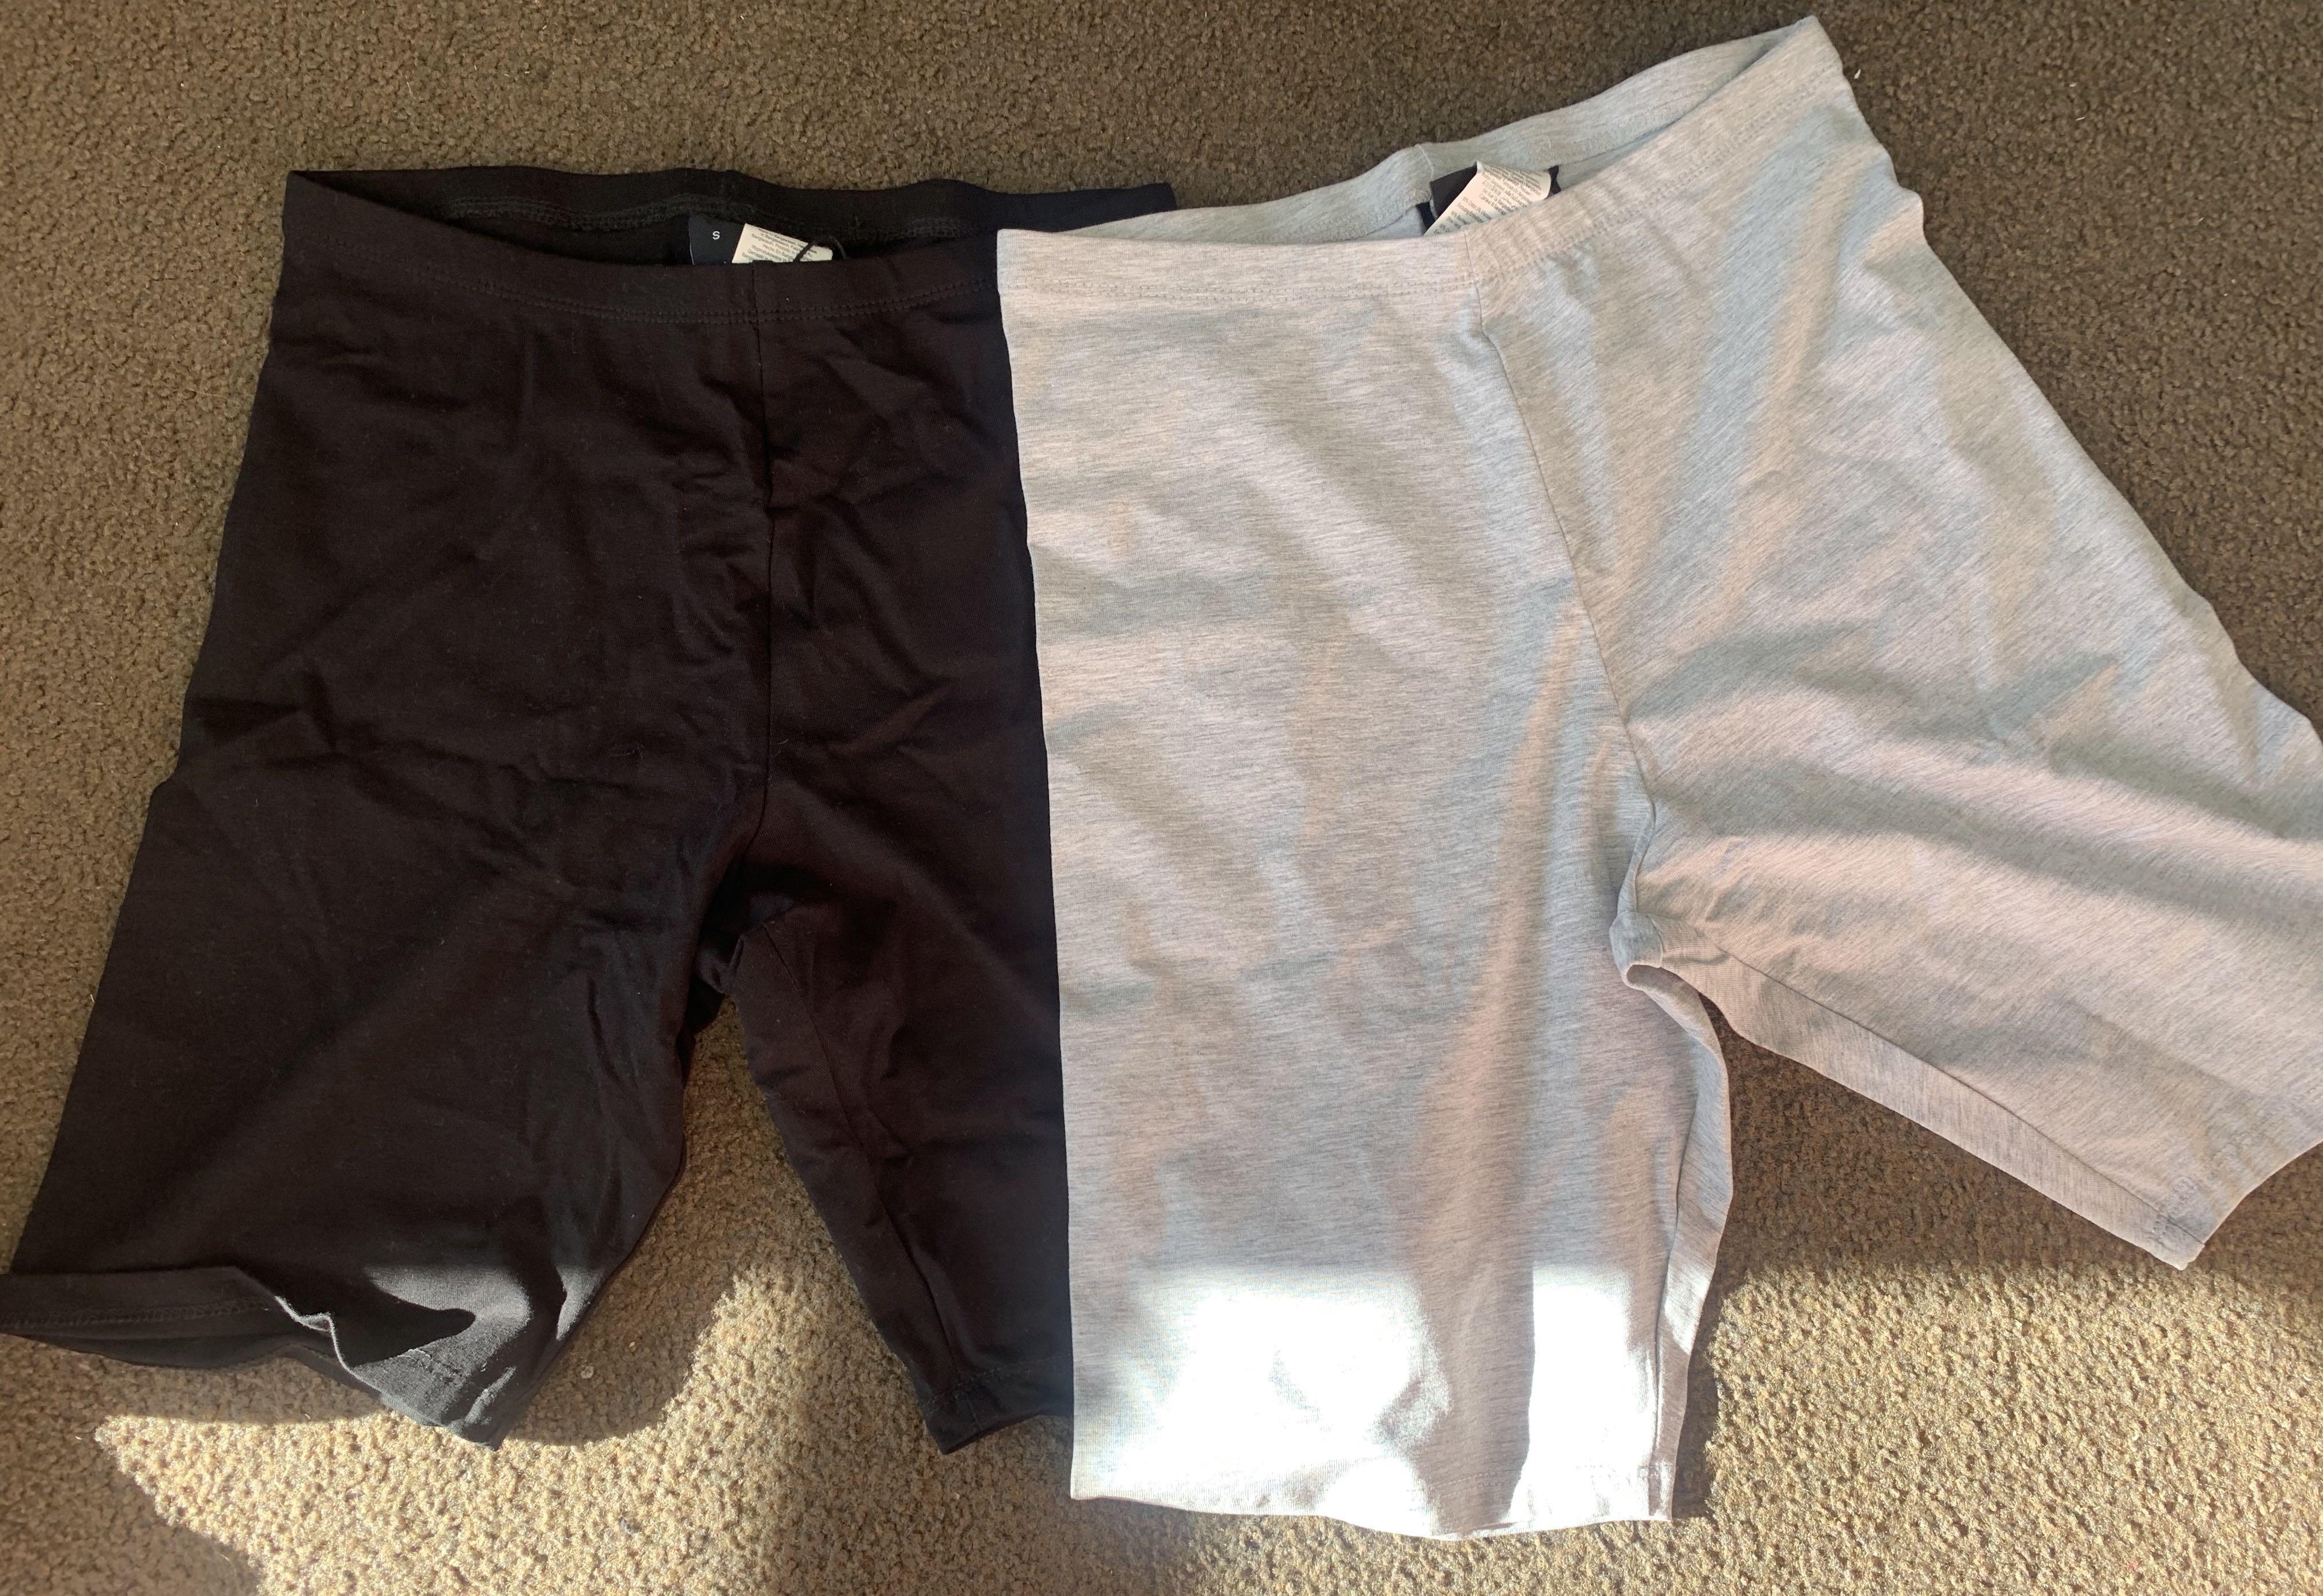 Bike Shorts - Brand New